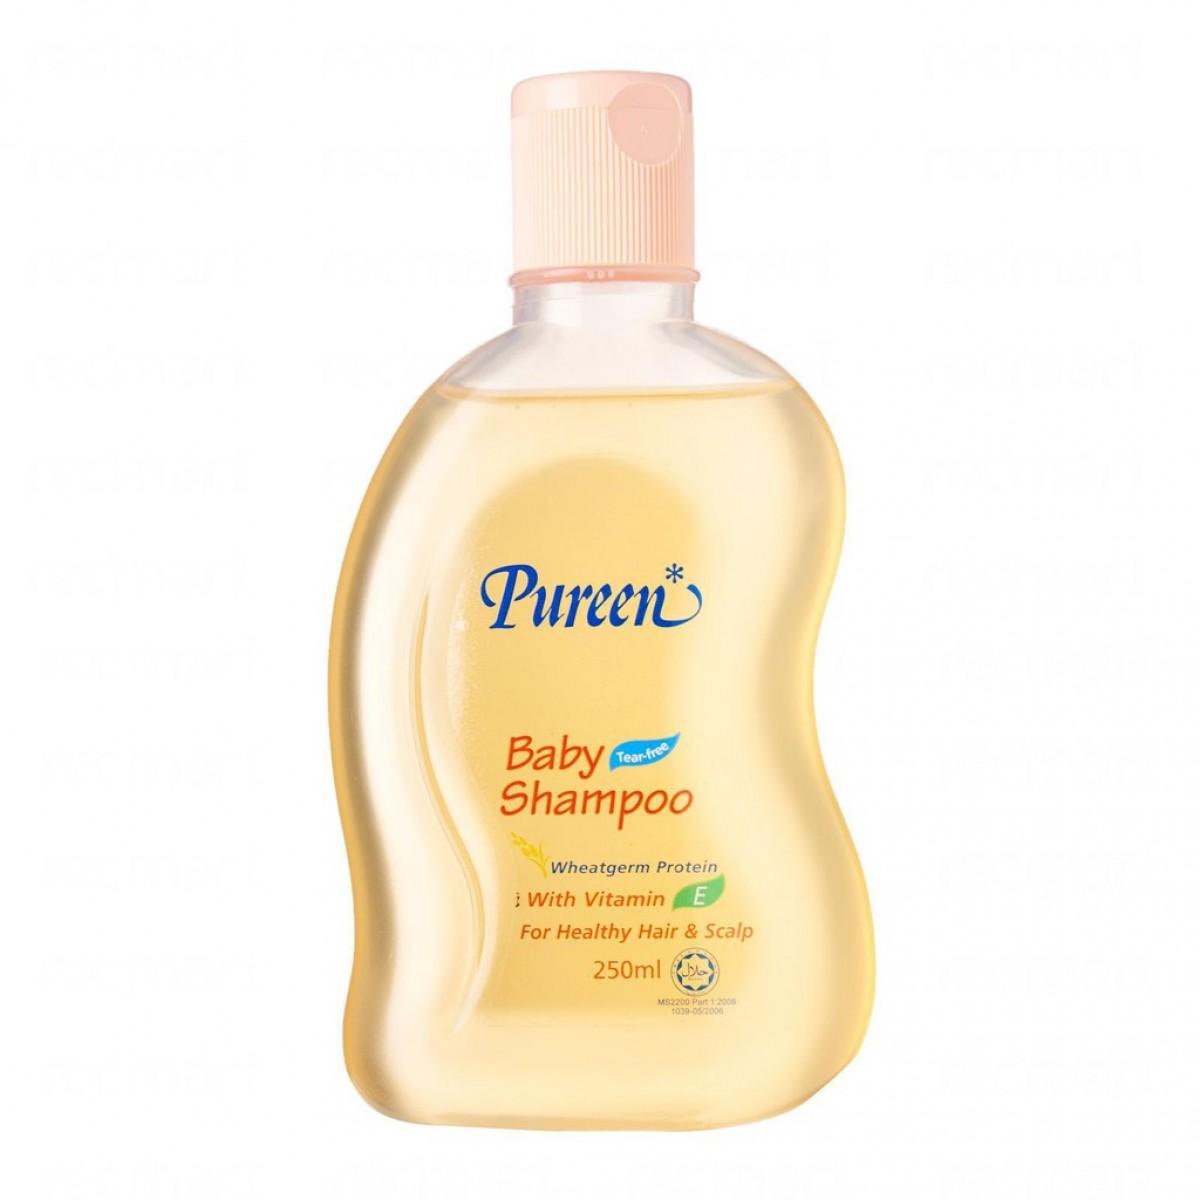 Pureen Baby Shampoo Wheatgrem Protein (250ml) - Kico Baby Center